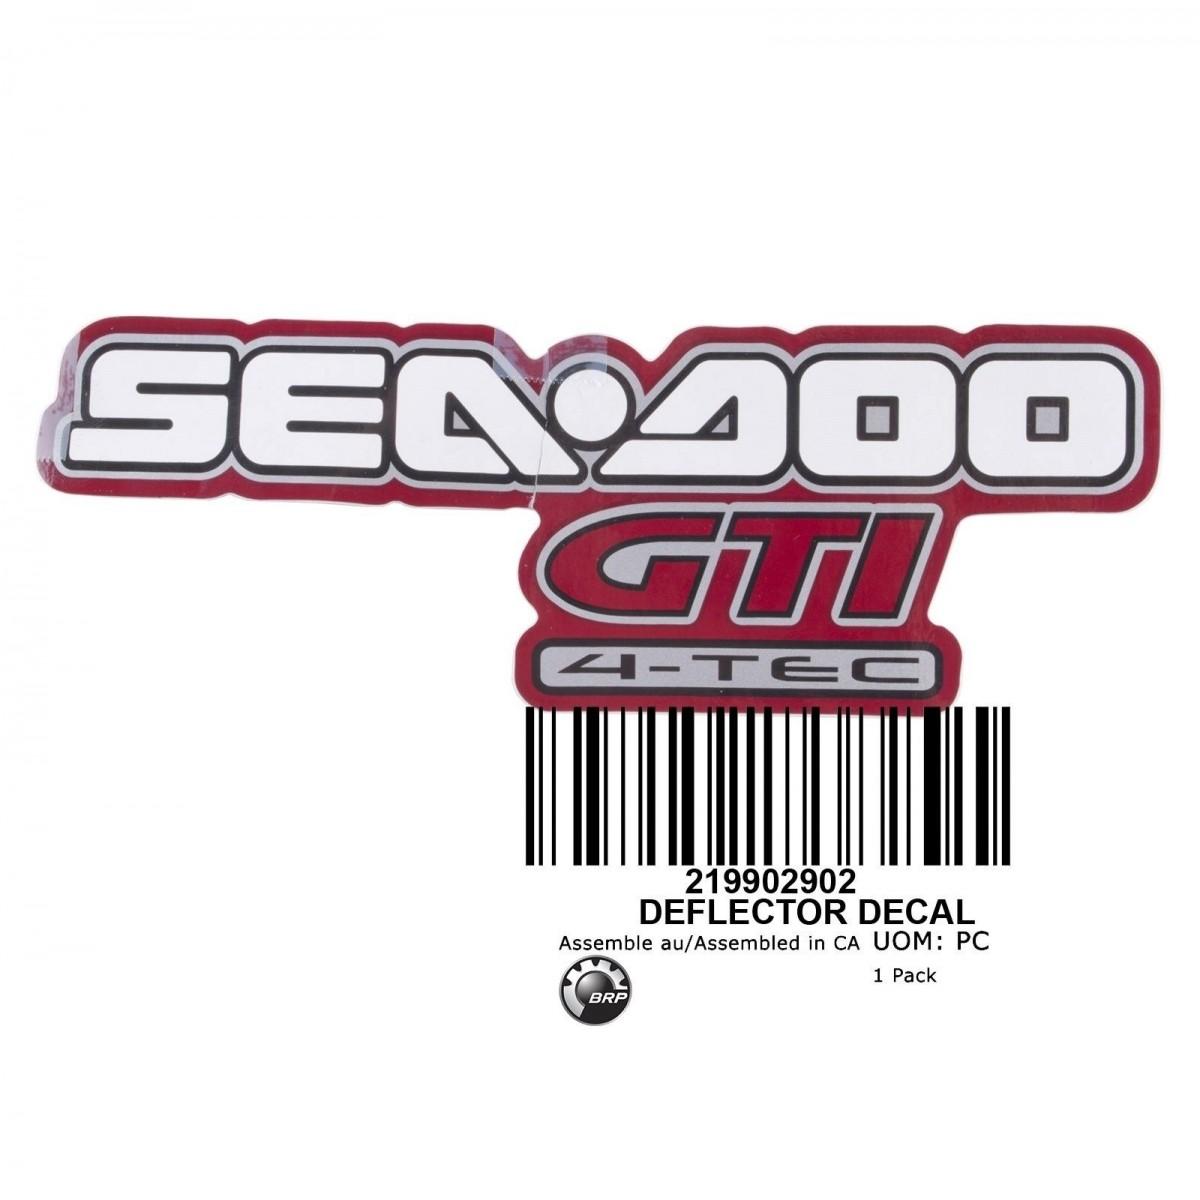 Adesivo do Defletor para Jet Ski Sea Doo GTI 4 TEC 09 Vermelho/Branco 219902902  - Radical Peças - Peças para Jet Ski